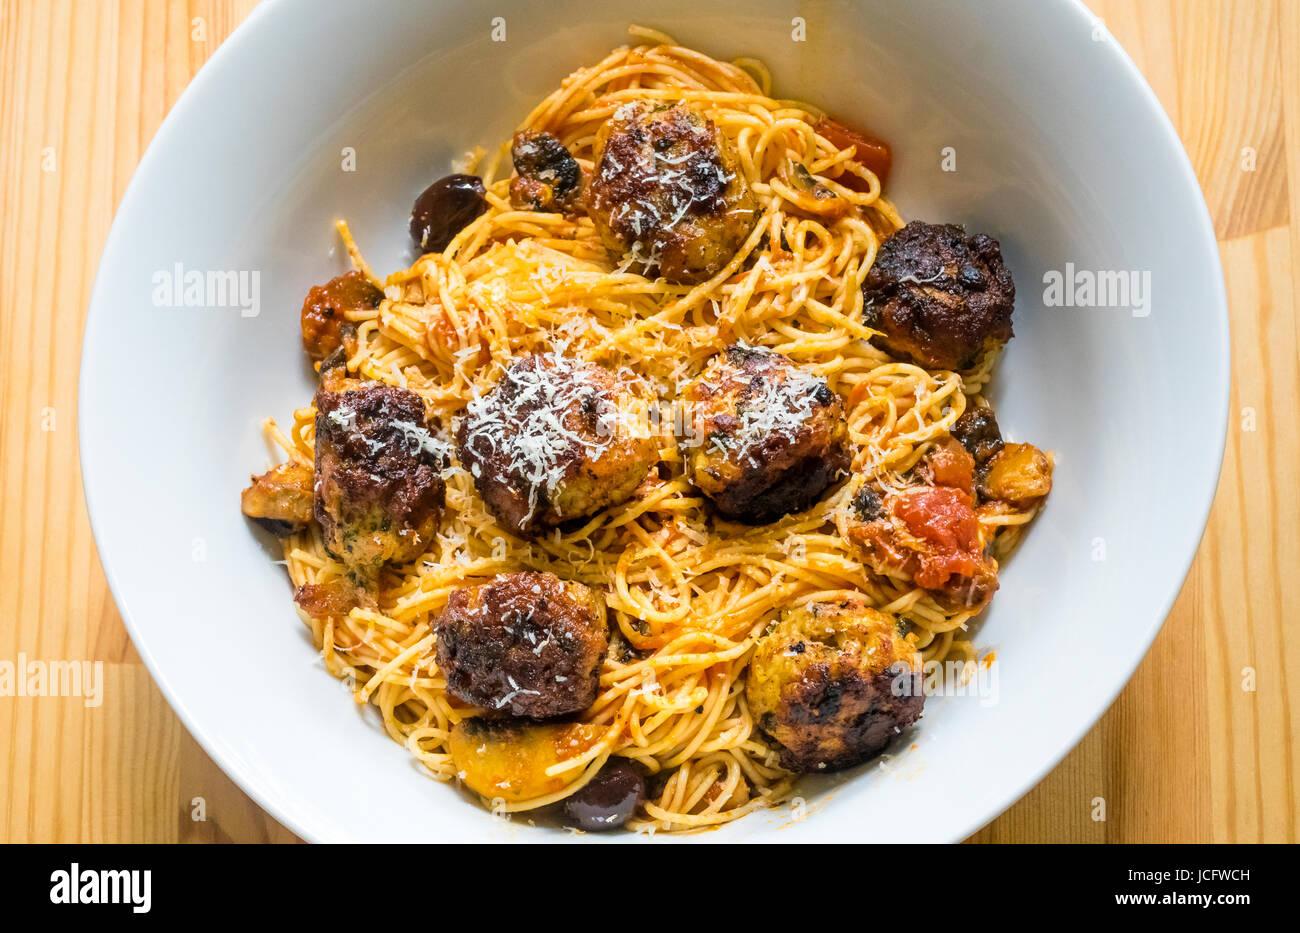 Spaghetti and Italian meatballs in a white bowl - Stock Image